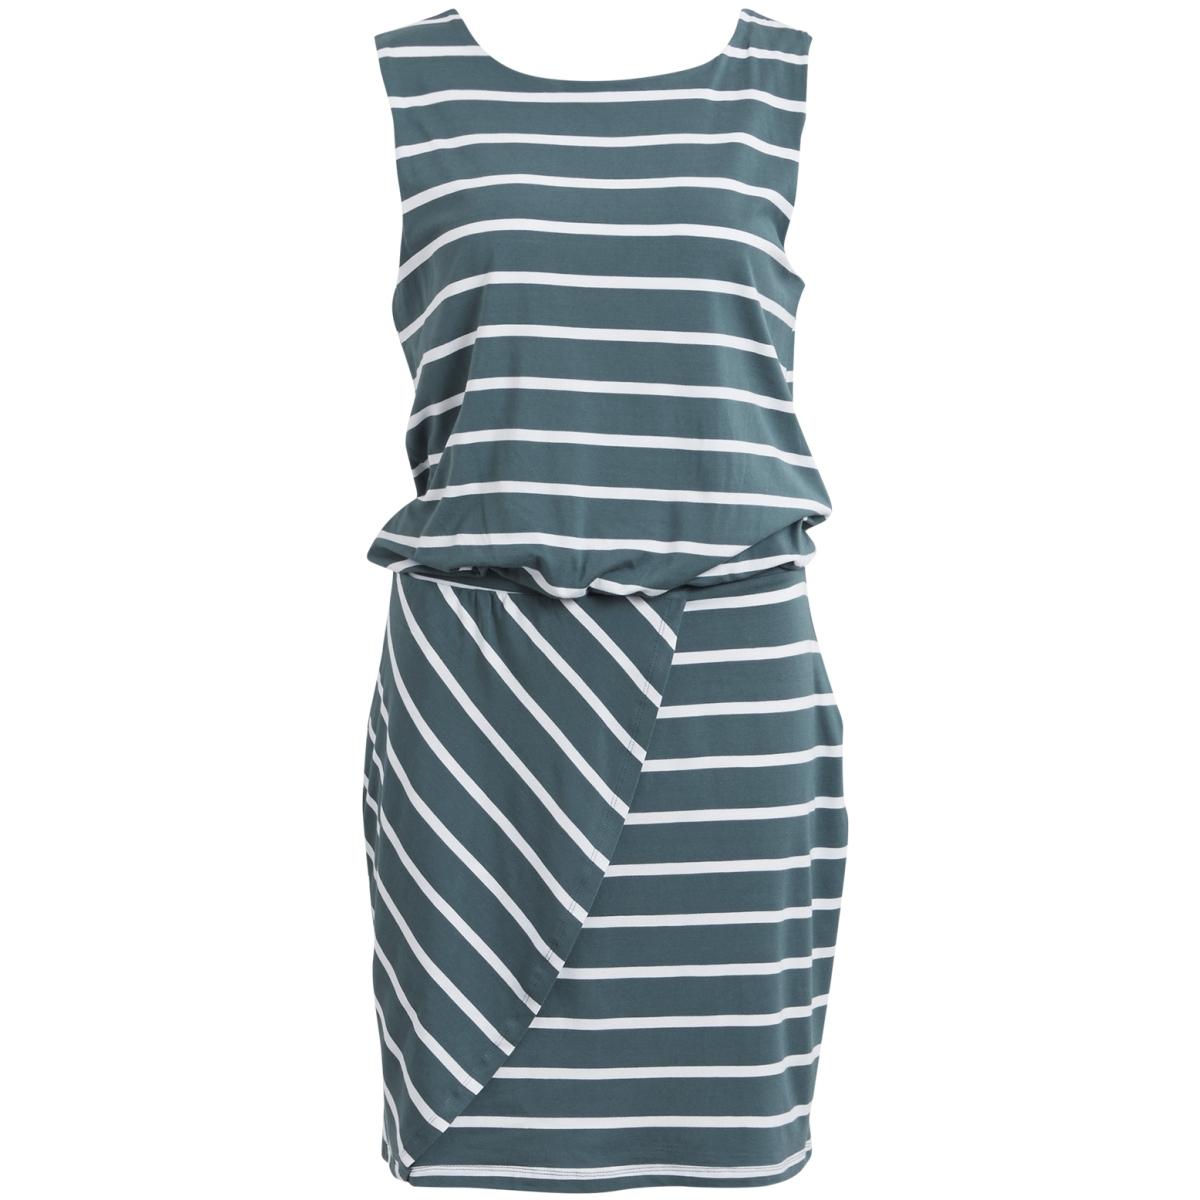 objelona wrap s/l dress 23023662 object jurk balsam green